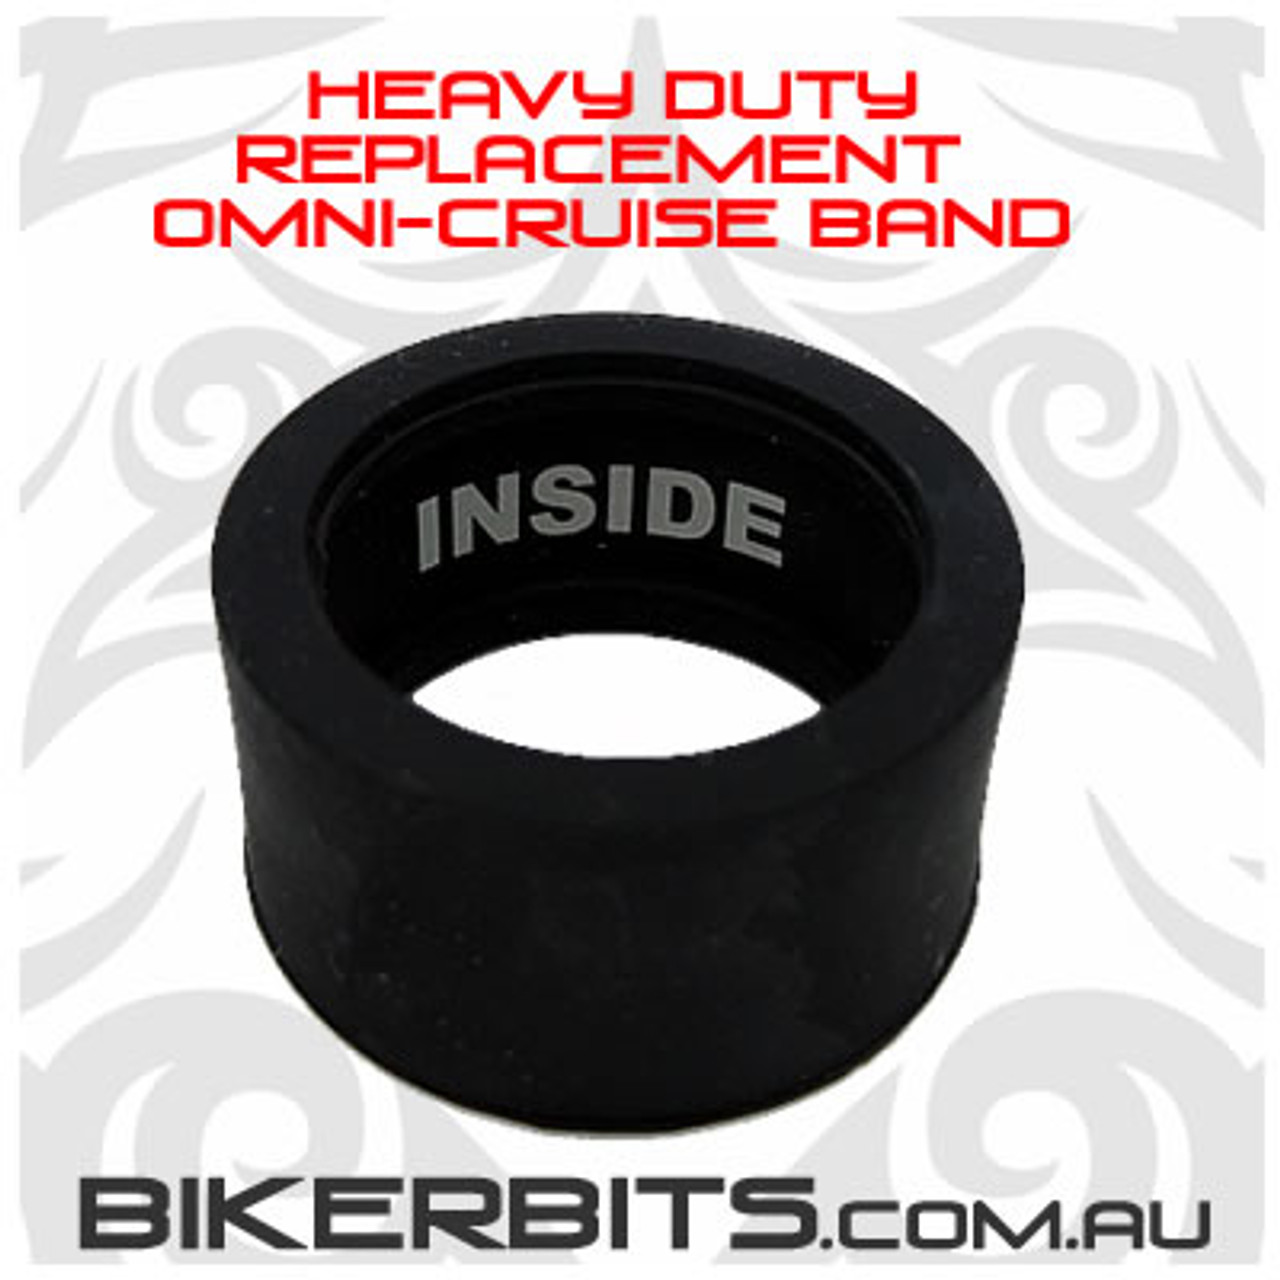 Omni-Cruise - Replacement OMNI-CRUISE Band - HEAVY DUTY